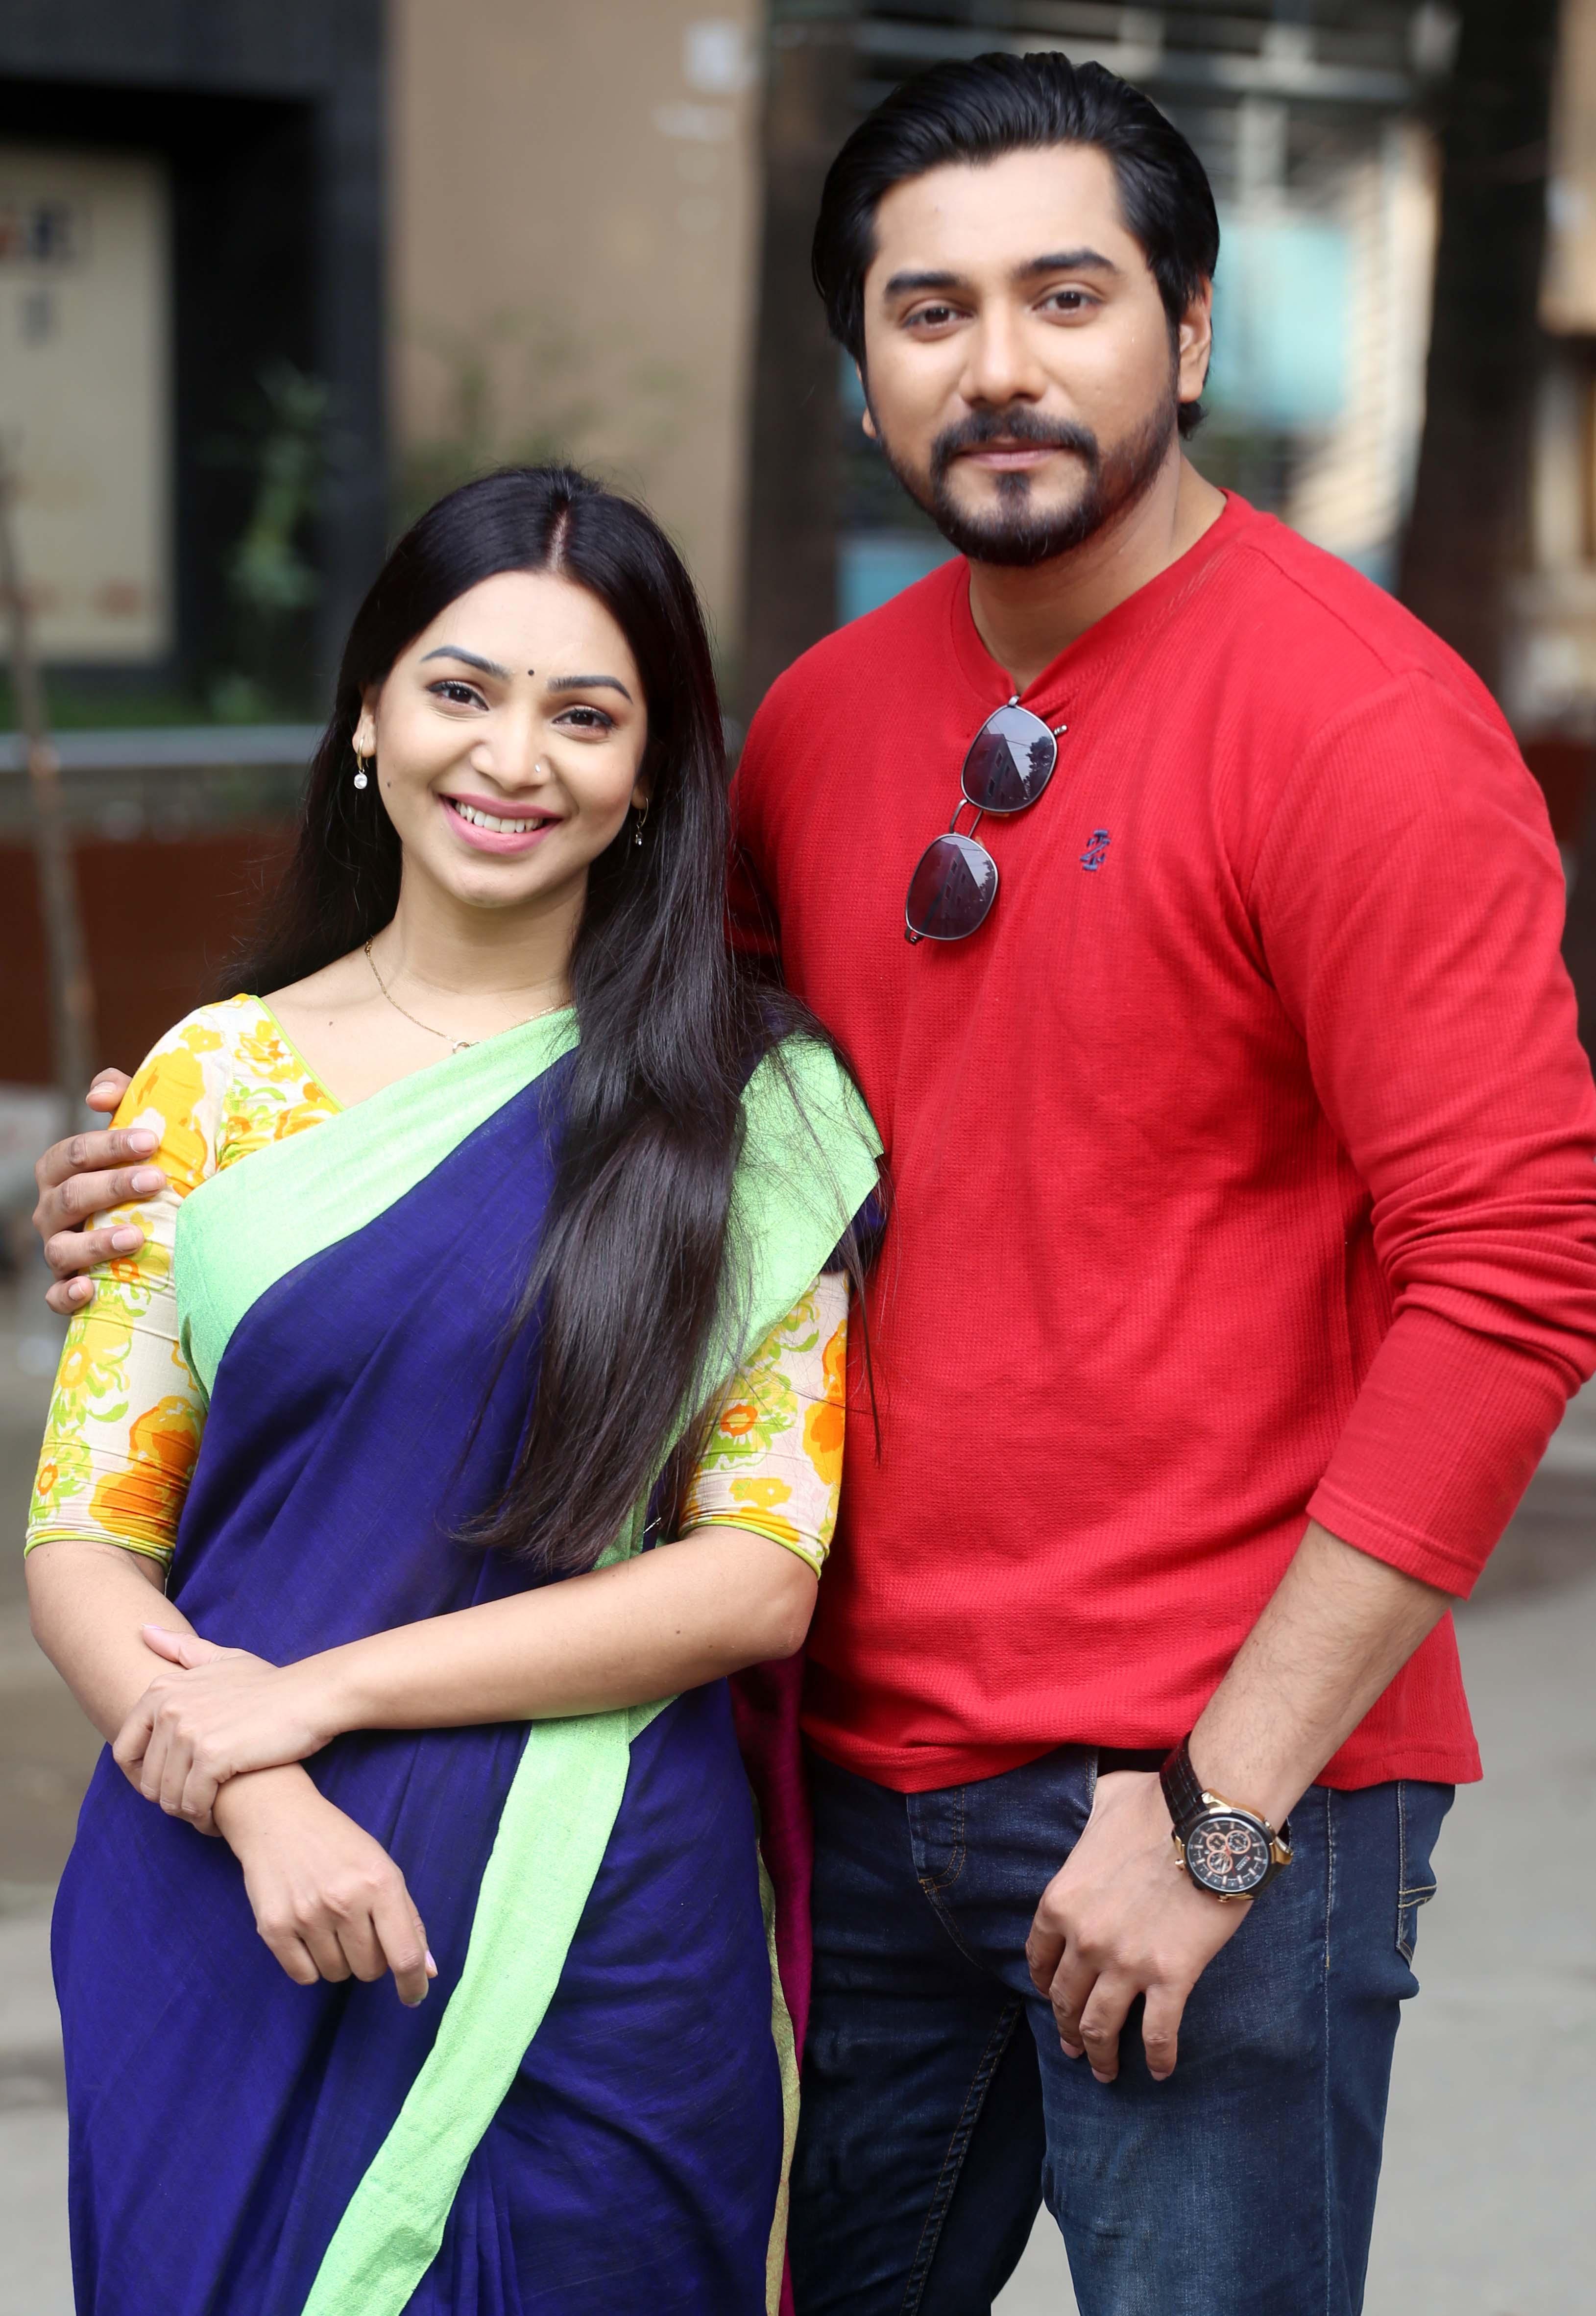 Prova, Tanvir get appreciation as a pair